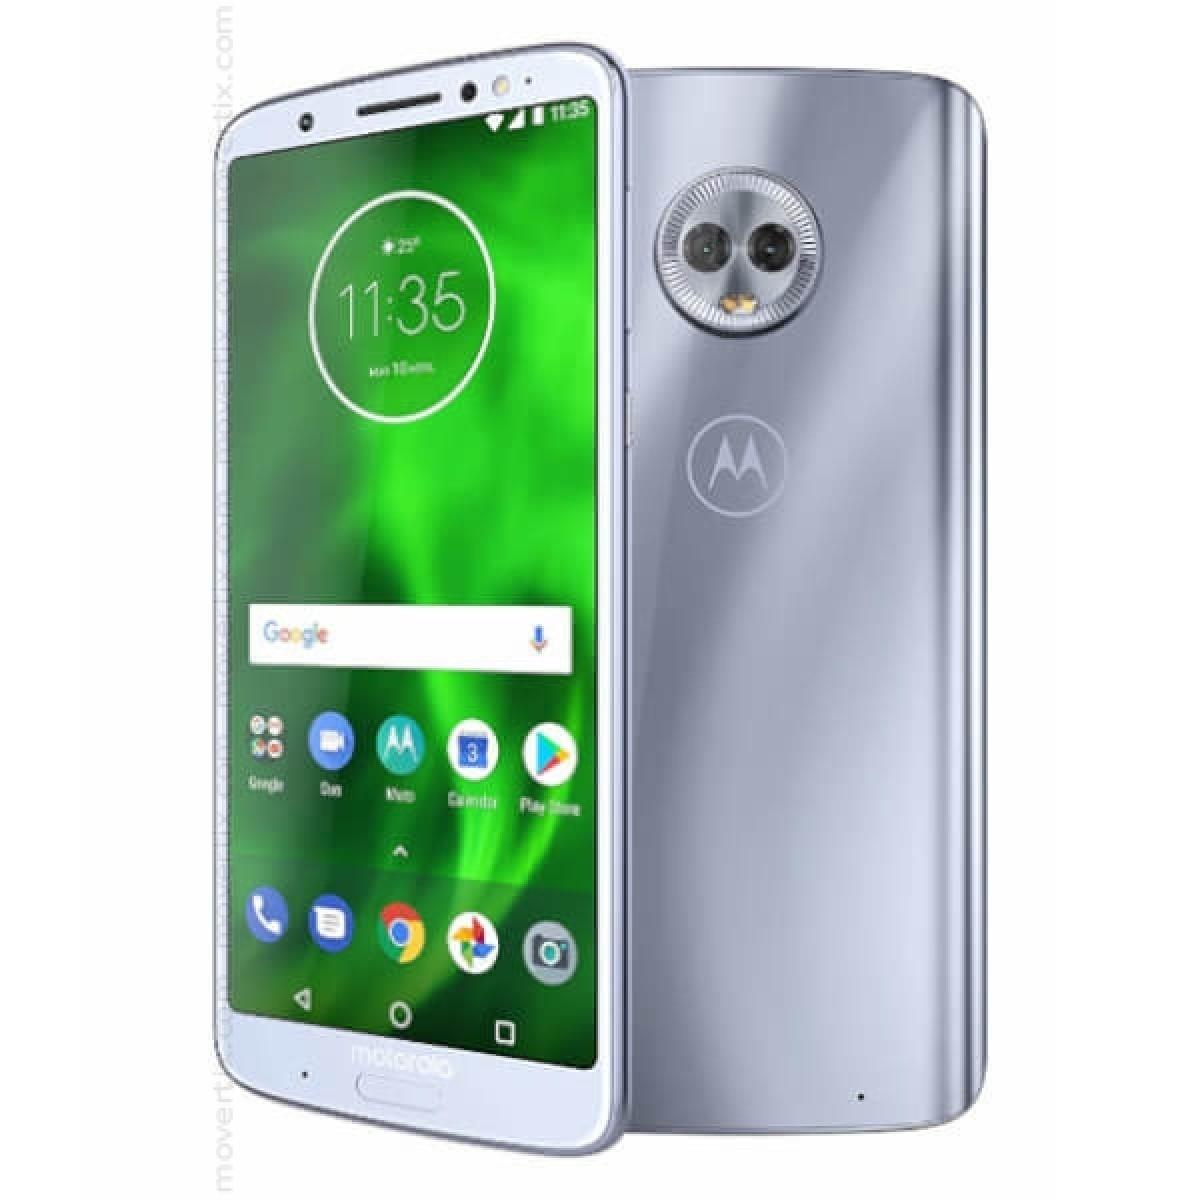 af593dc8ec3 Motorola Moto G6 Plus Dual SIM en Plata de 64GB y 4GB RAM - XT1926-3 ...